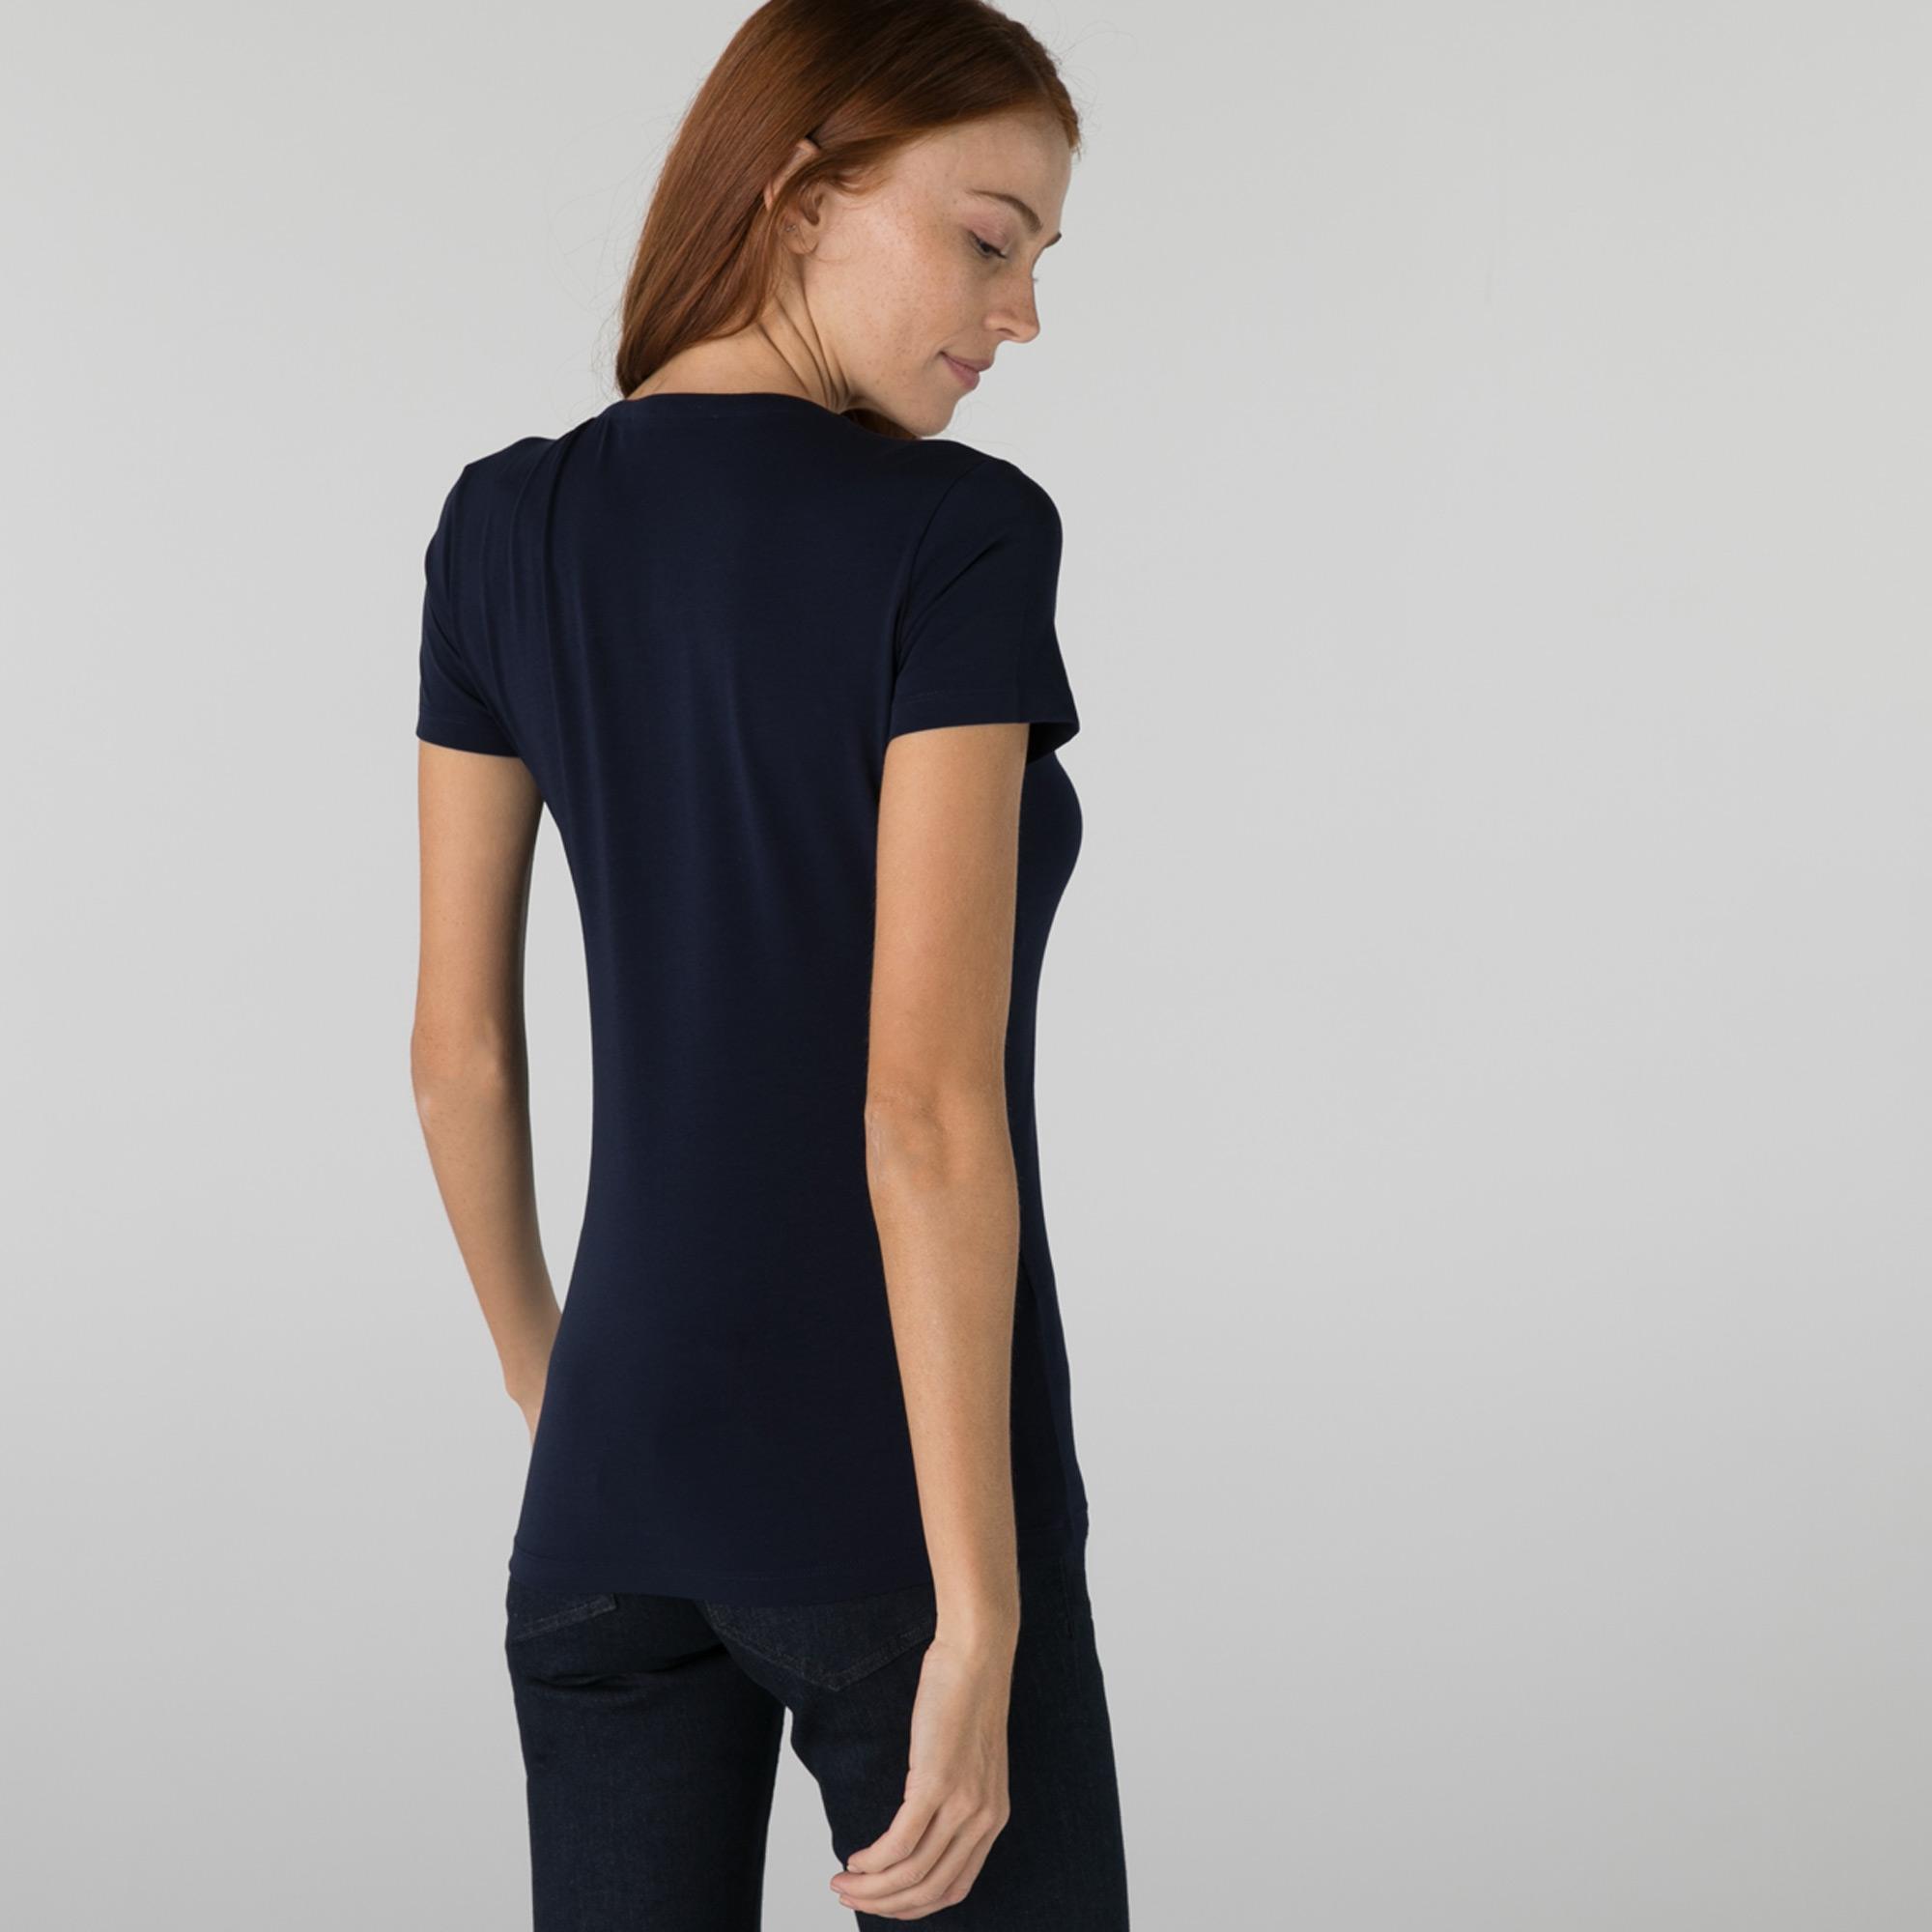 Lacoste Kadın Slim Fit V Yaka Lacivert T-Shirt